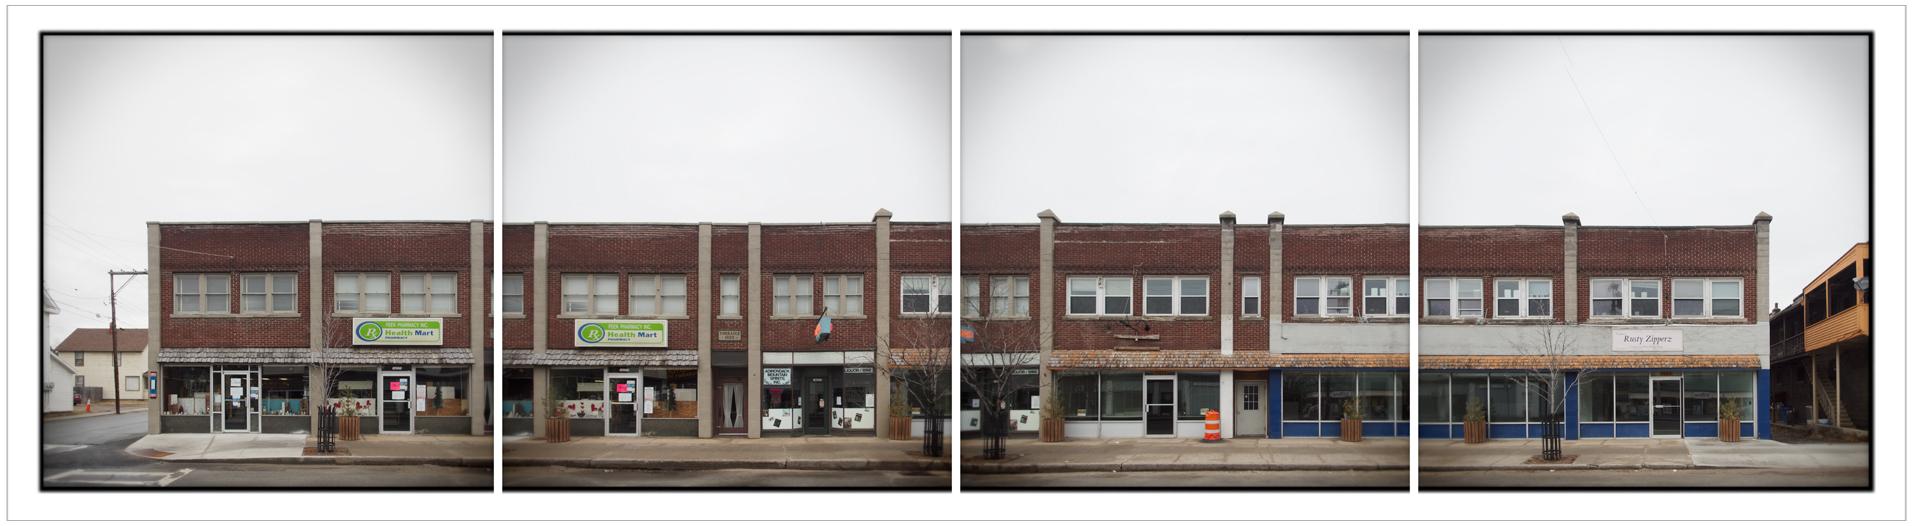 west side Main Street # 1   ~ Au Sable Forks, NY (embiggenable)